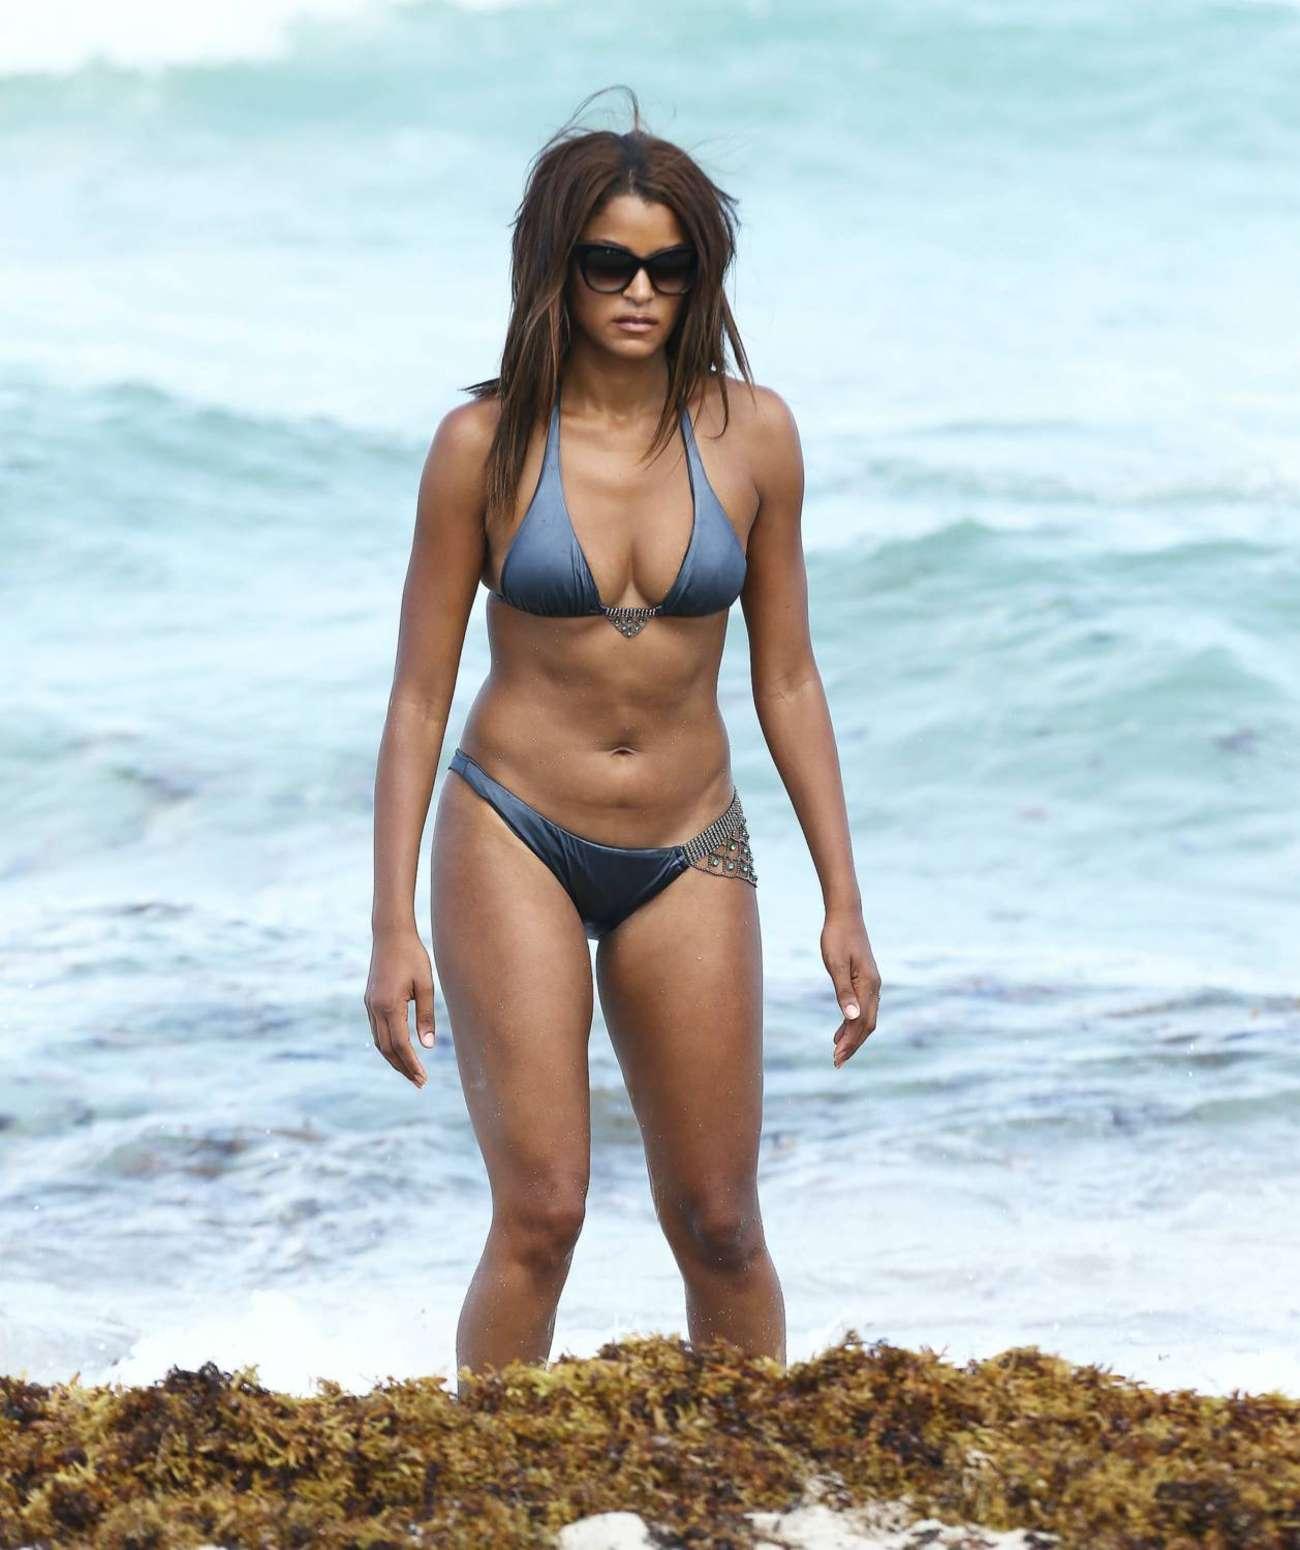 Erika Jordan posando en bikini en la playa XnoStarscom